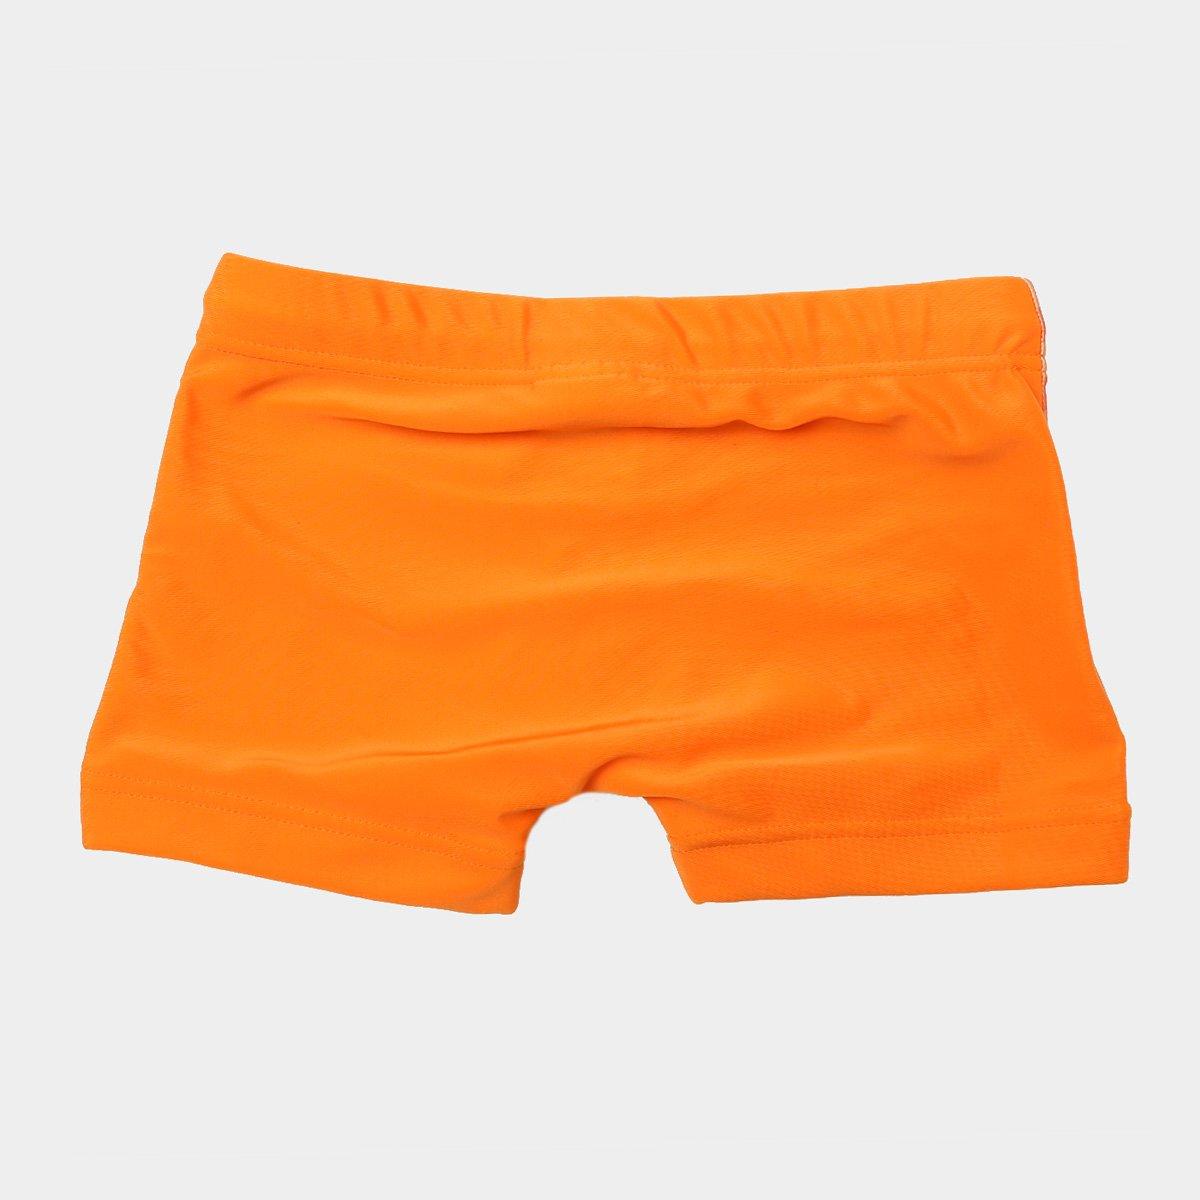 0e423a2c48 Sunga Boxer Infantil Tip Top Estampada Masculina